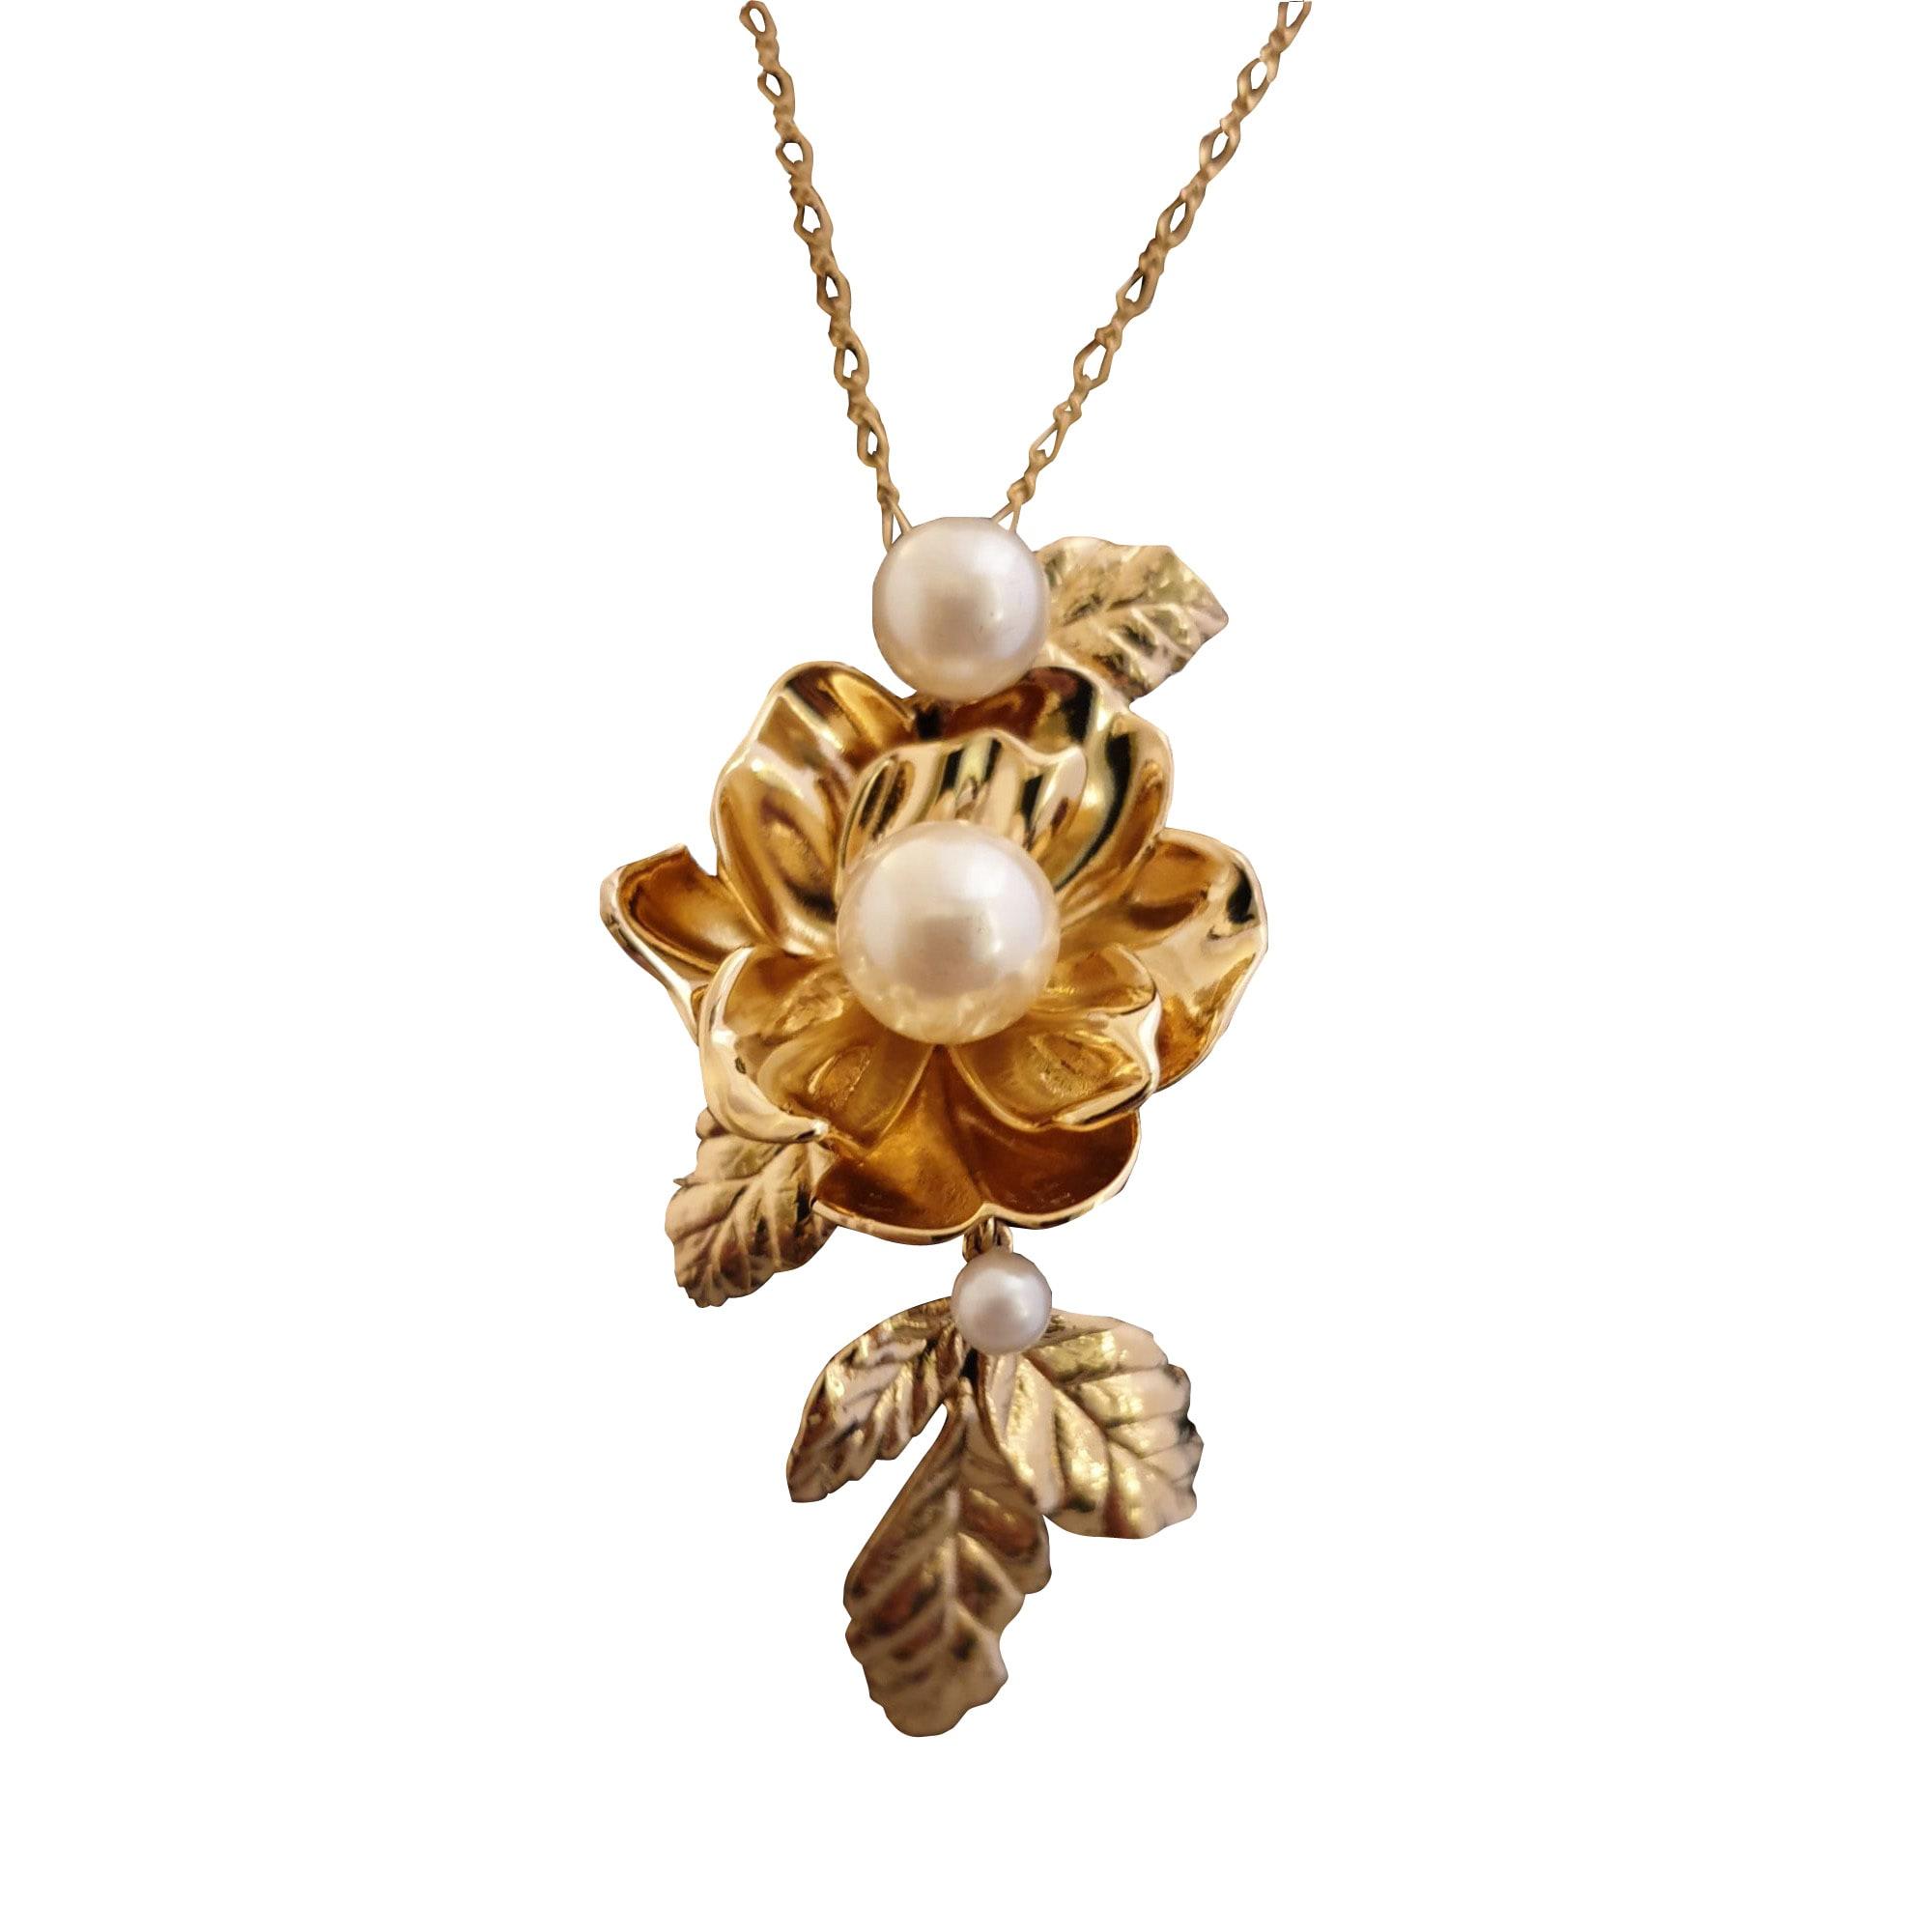 Pendentif, collier pendentif KATE SPADE métal doré